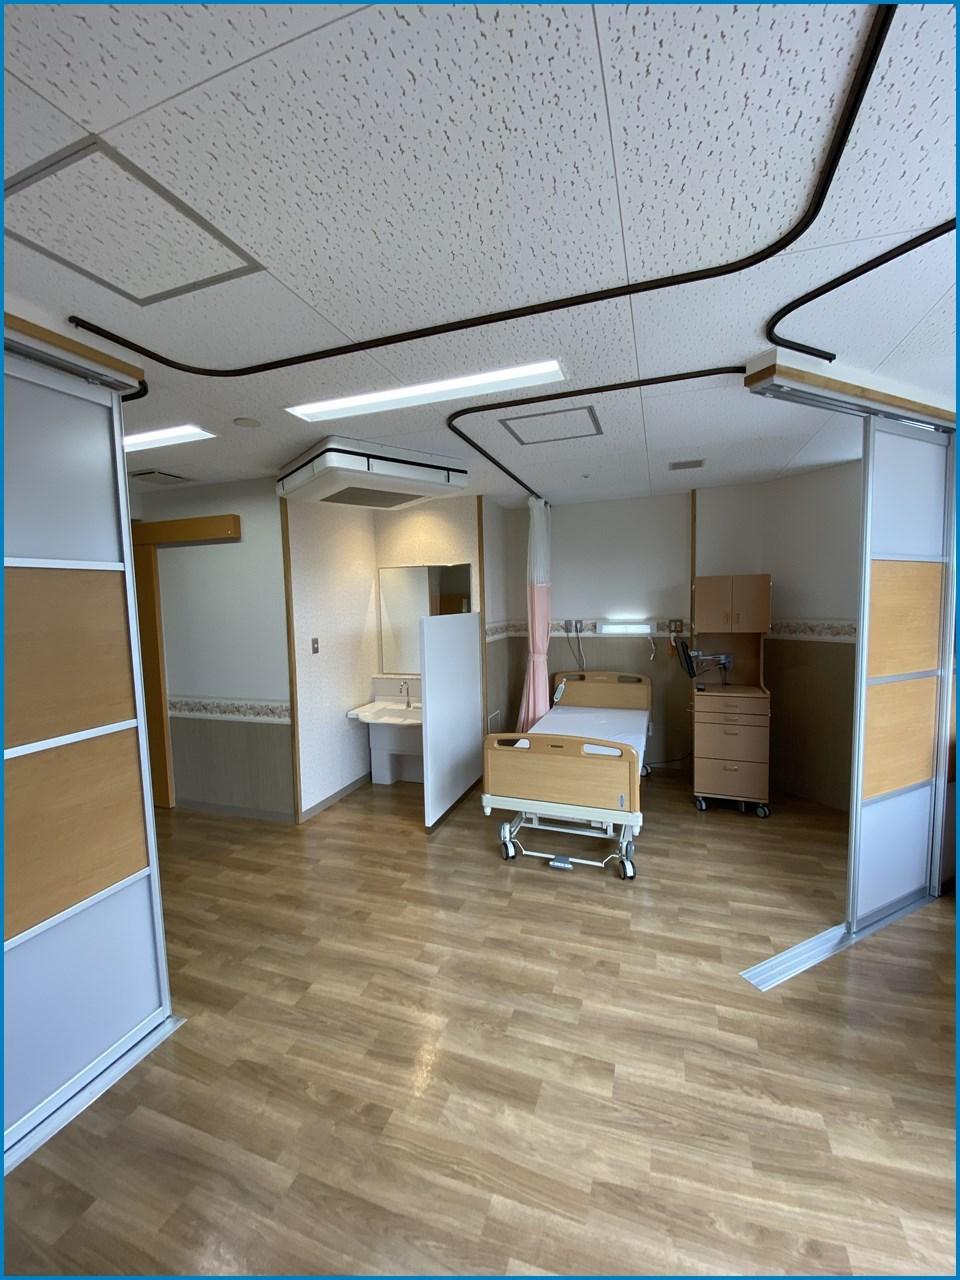 N病院グループ N病院東館 介護医療院転換改修工事 1_c0376508_16015582.jpg